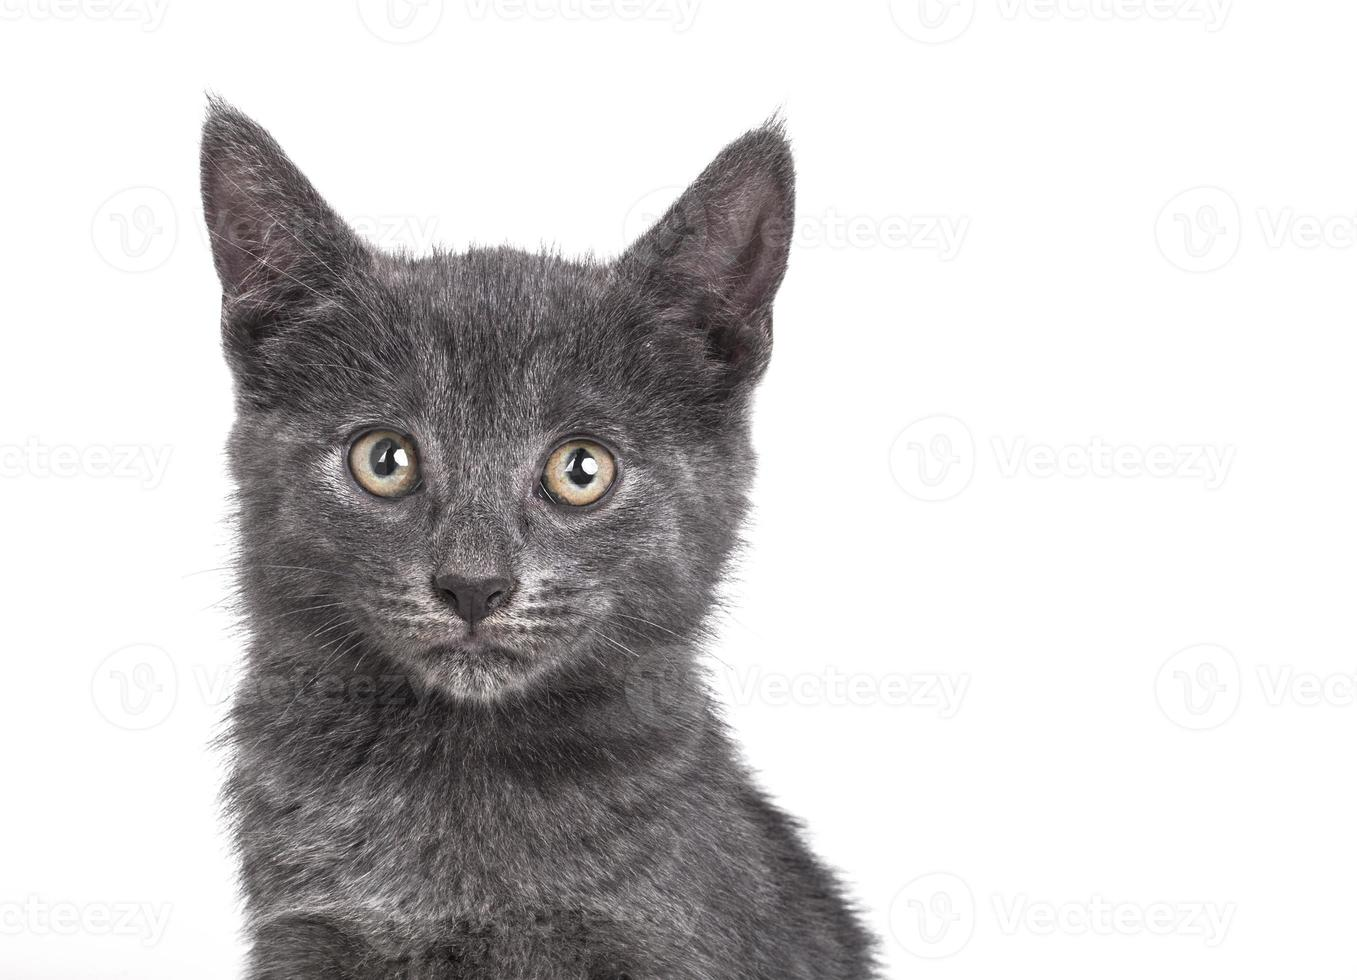 petit chat britannique gris photo